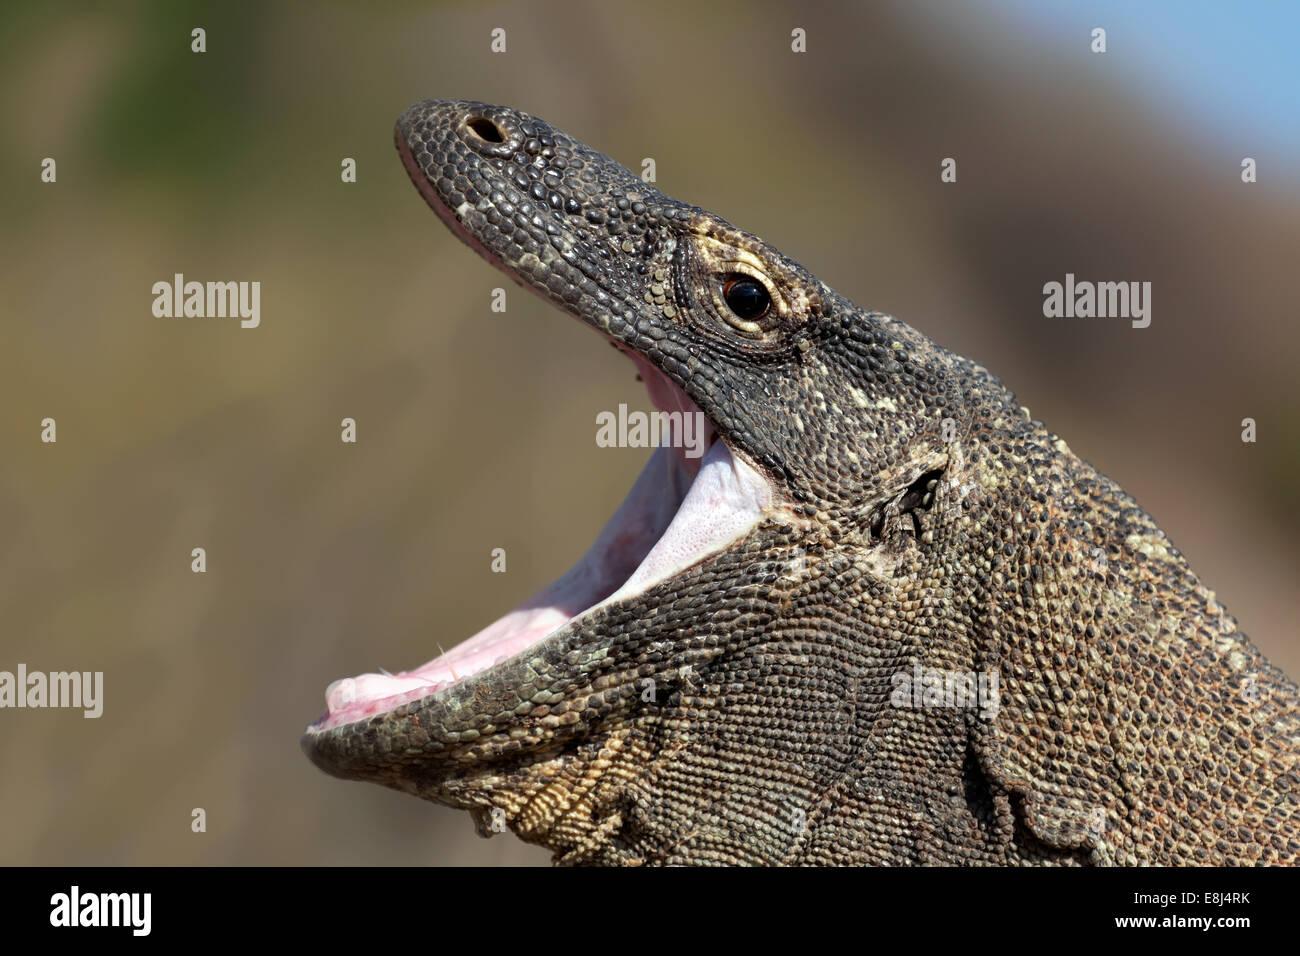 Komodo Dragon (Varanus komodoensis), yawning with mouth wide open, Komodo National Park, Unesco World Heritage Site - Stock Image